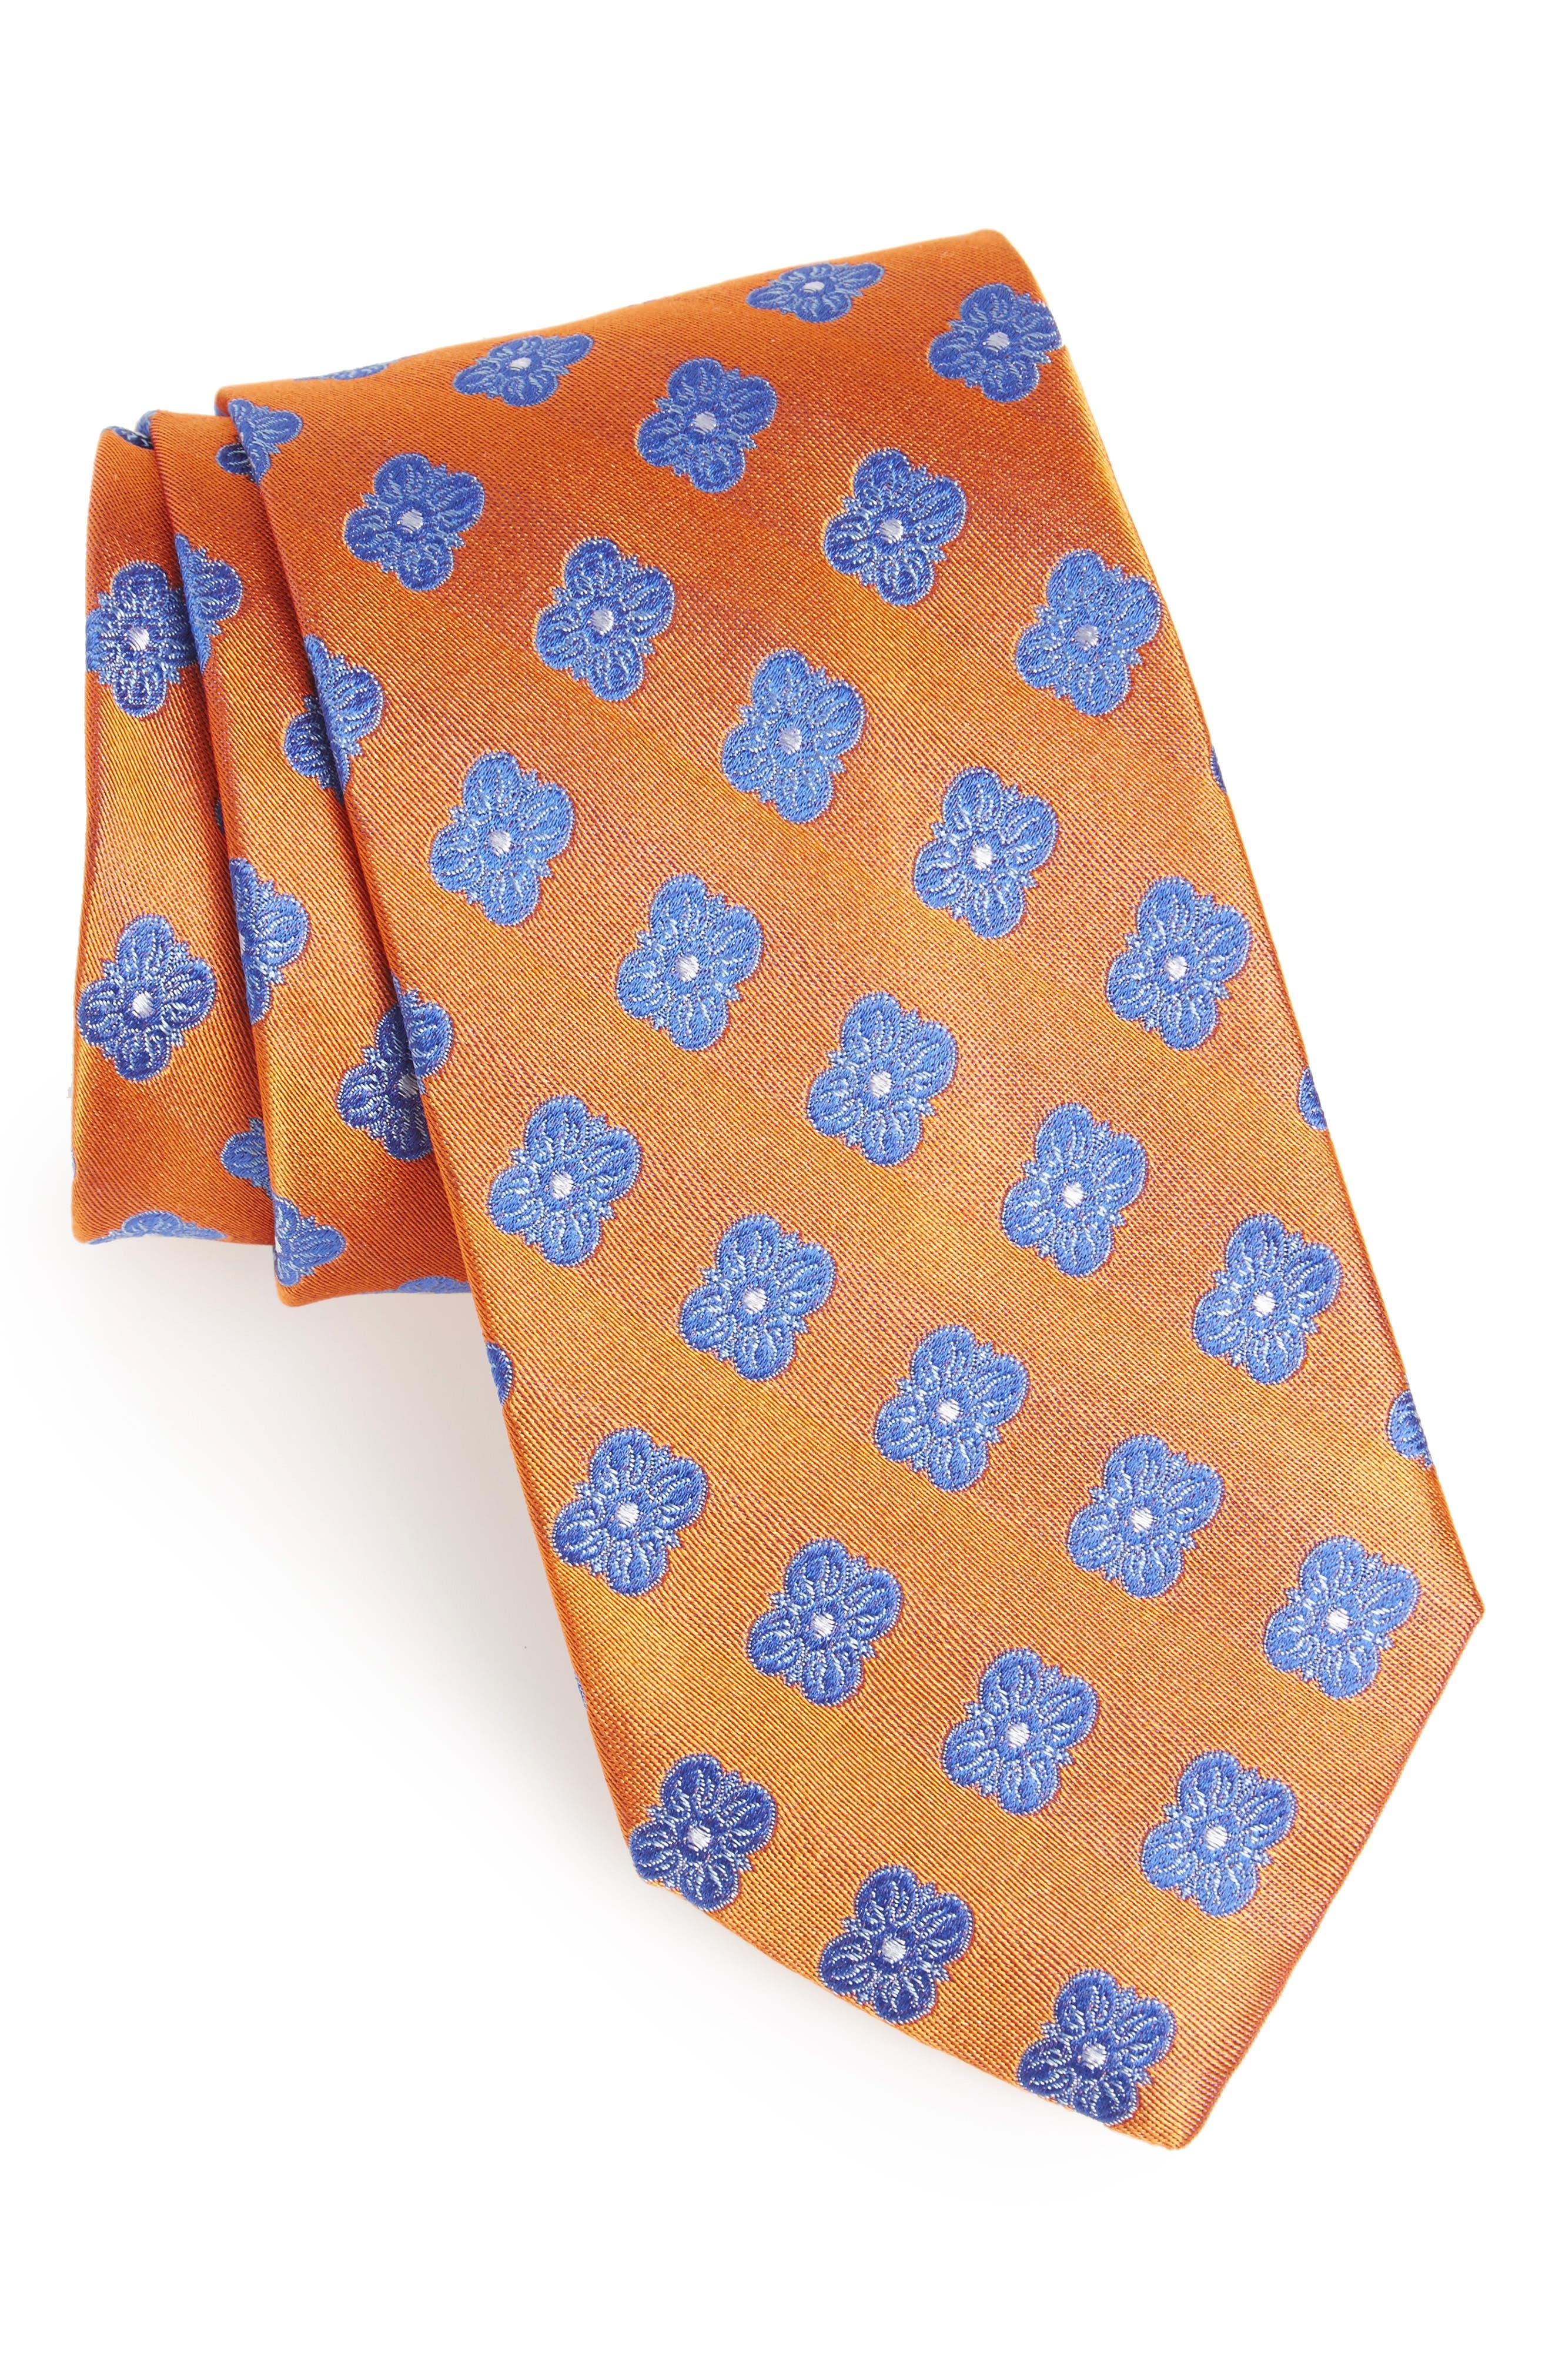 Cameron Floral Medallion Silk Tie,                             Main thumbnail 1, color,                             Orange